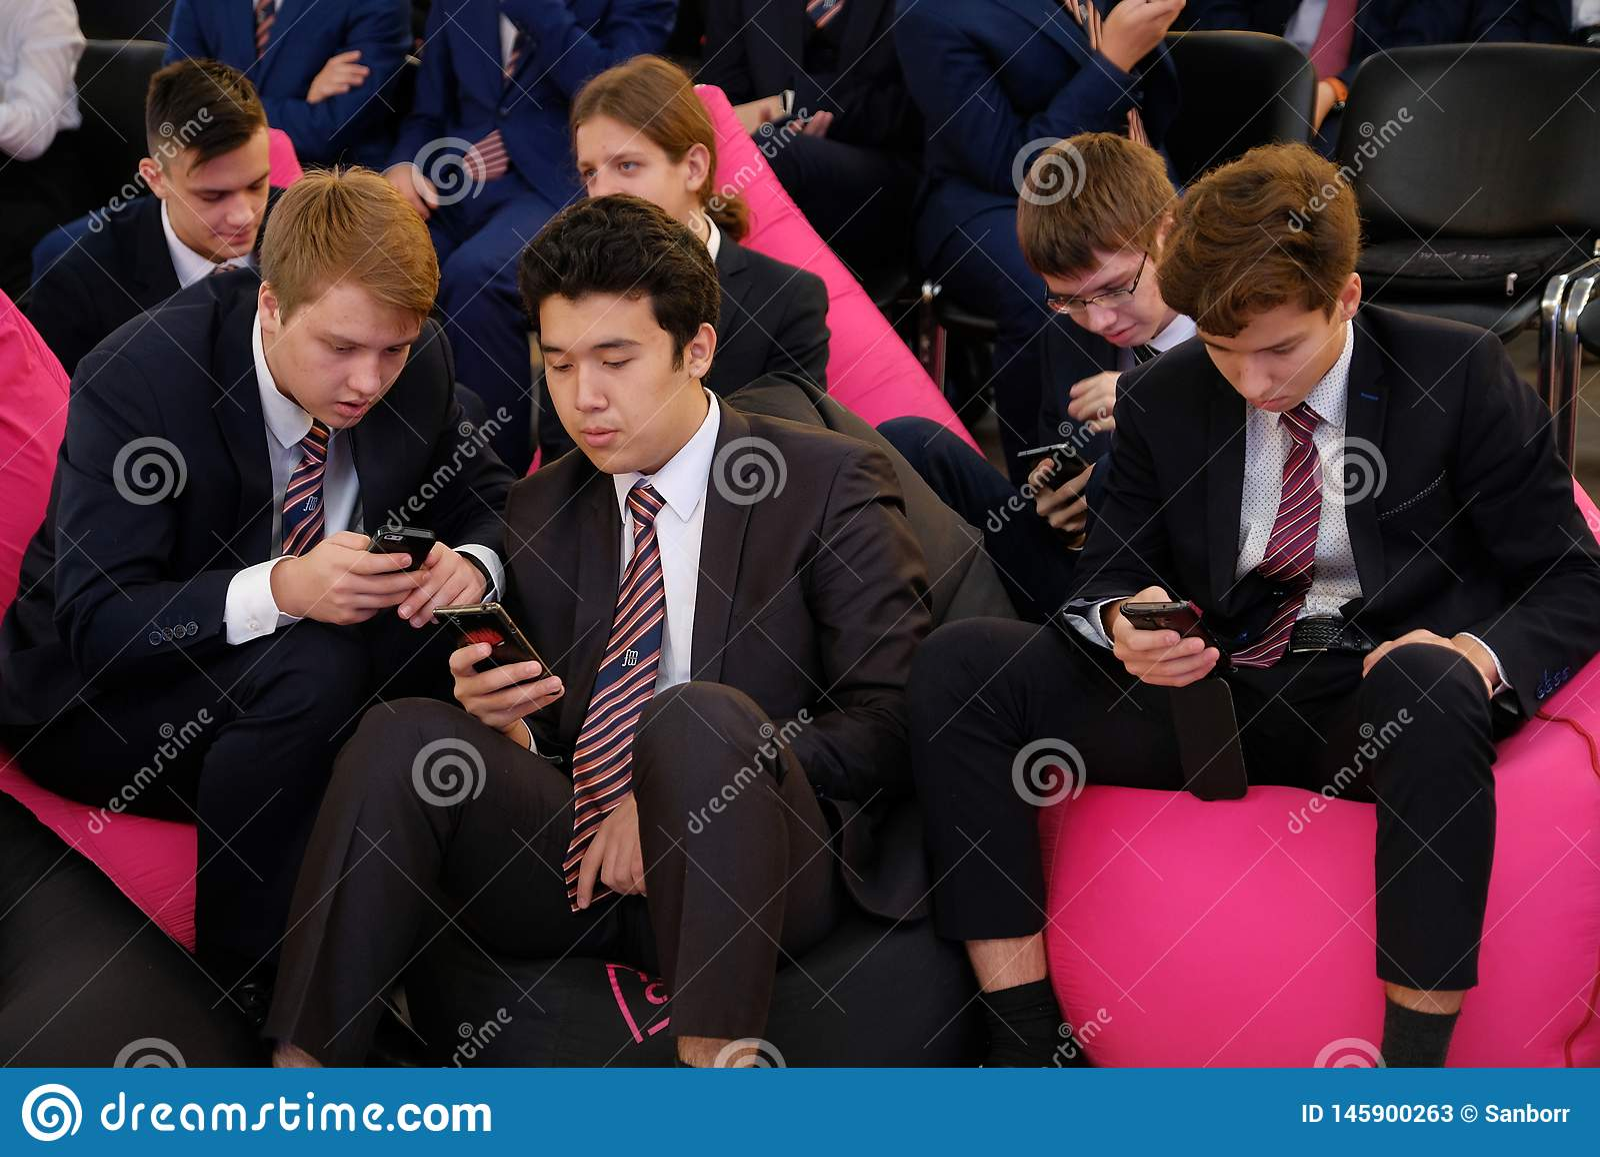 Tyumen, Ρωσία, 10 11 2018 Φόρουμ των καινοτόμων τεχνολογιών Επιστήμονες, πολιτικοί και επιχειρηματίες επικοινωνίας Μαθητές και